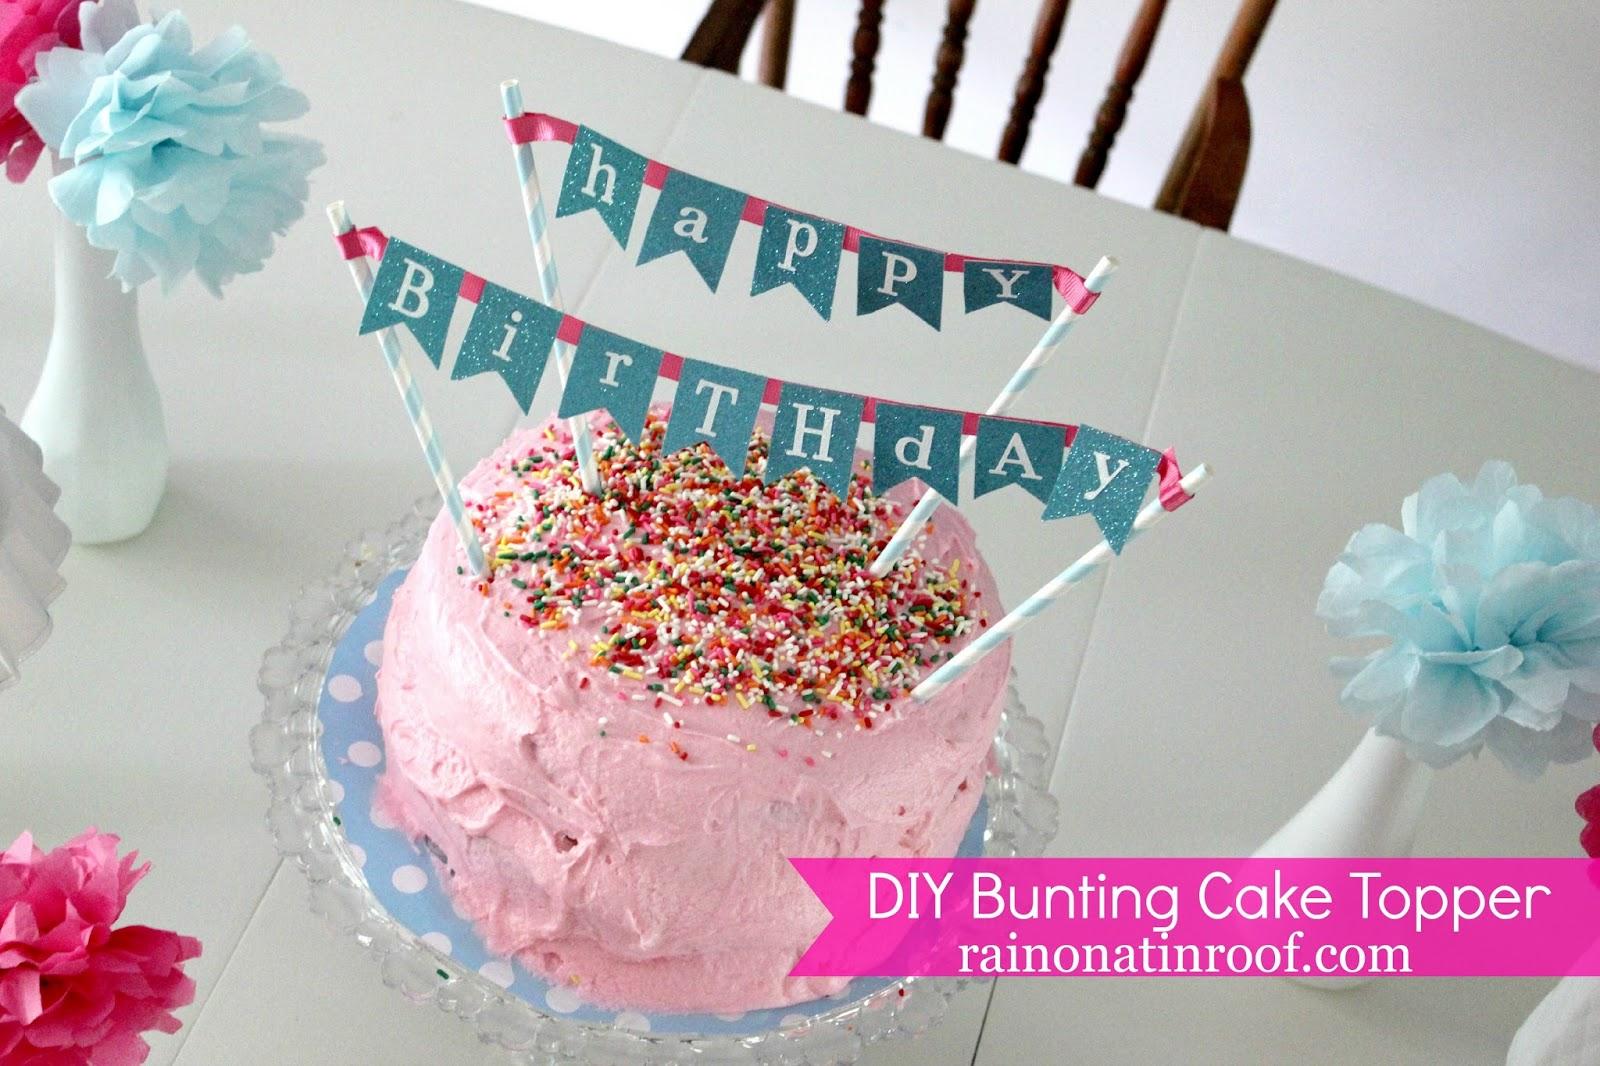 DIY Cake Bunting Topper